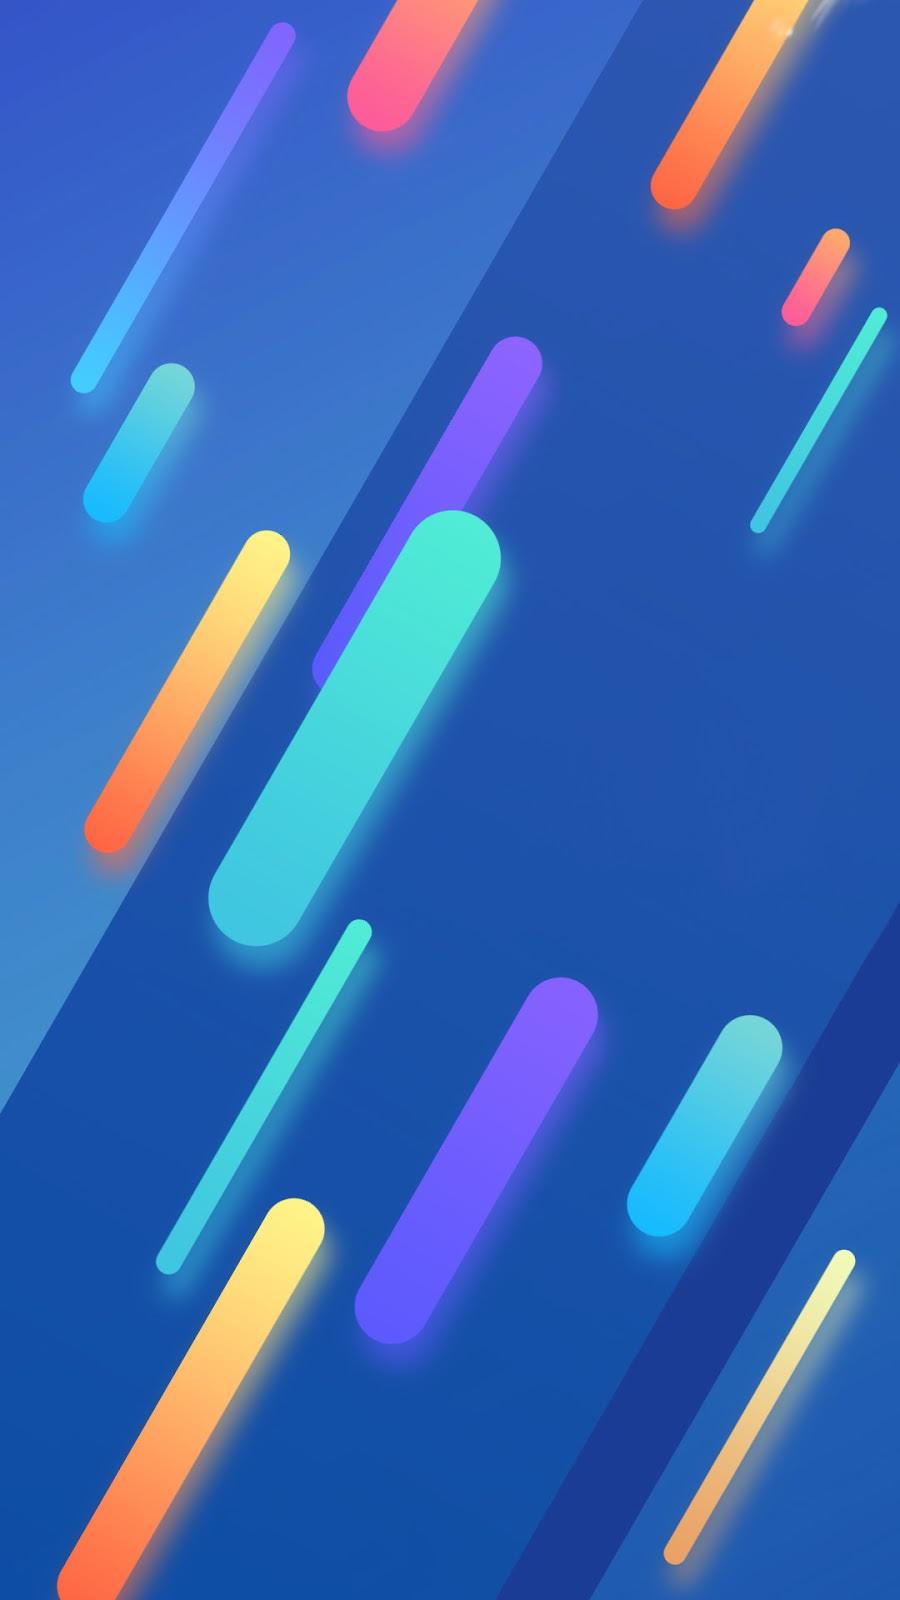 Free Download Leaked Xiaomi Mi 6 Stock Wallpapers | Tech